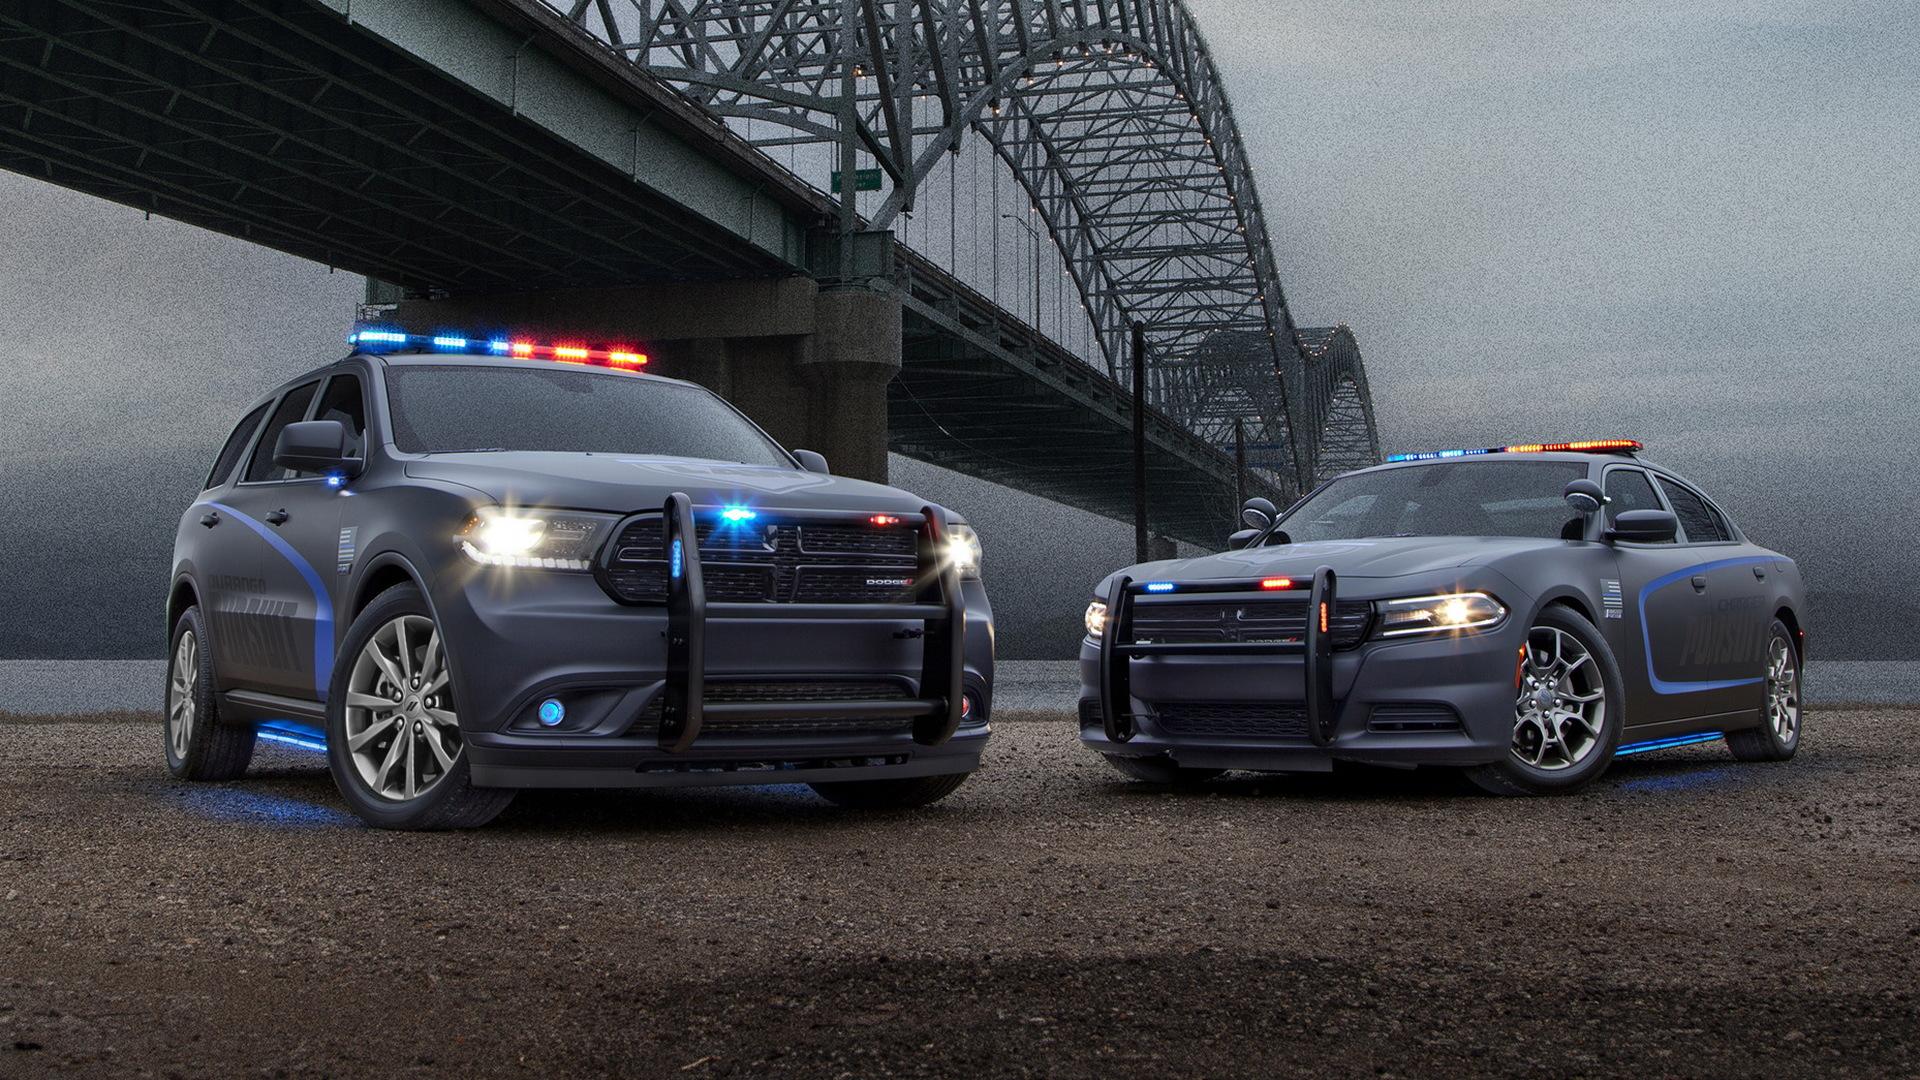 2018 Dodge Durango Pursuit and Charger Pursuit police cars